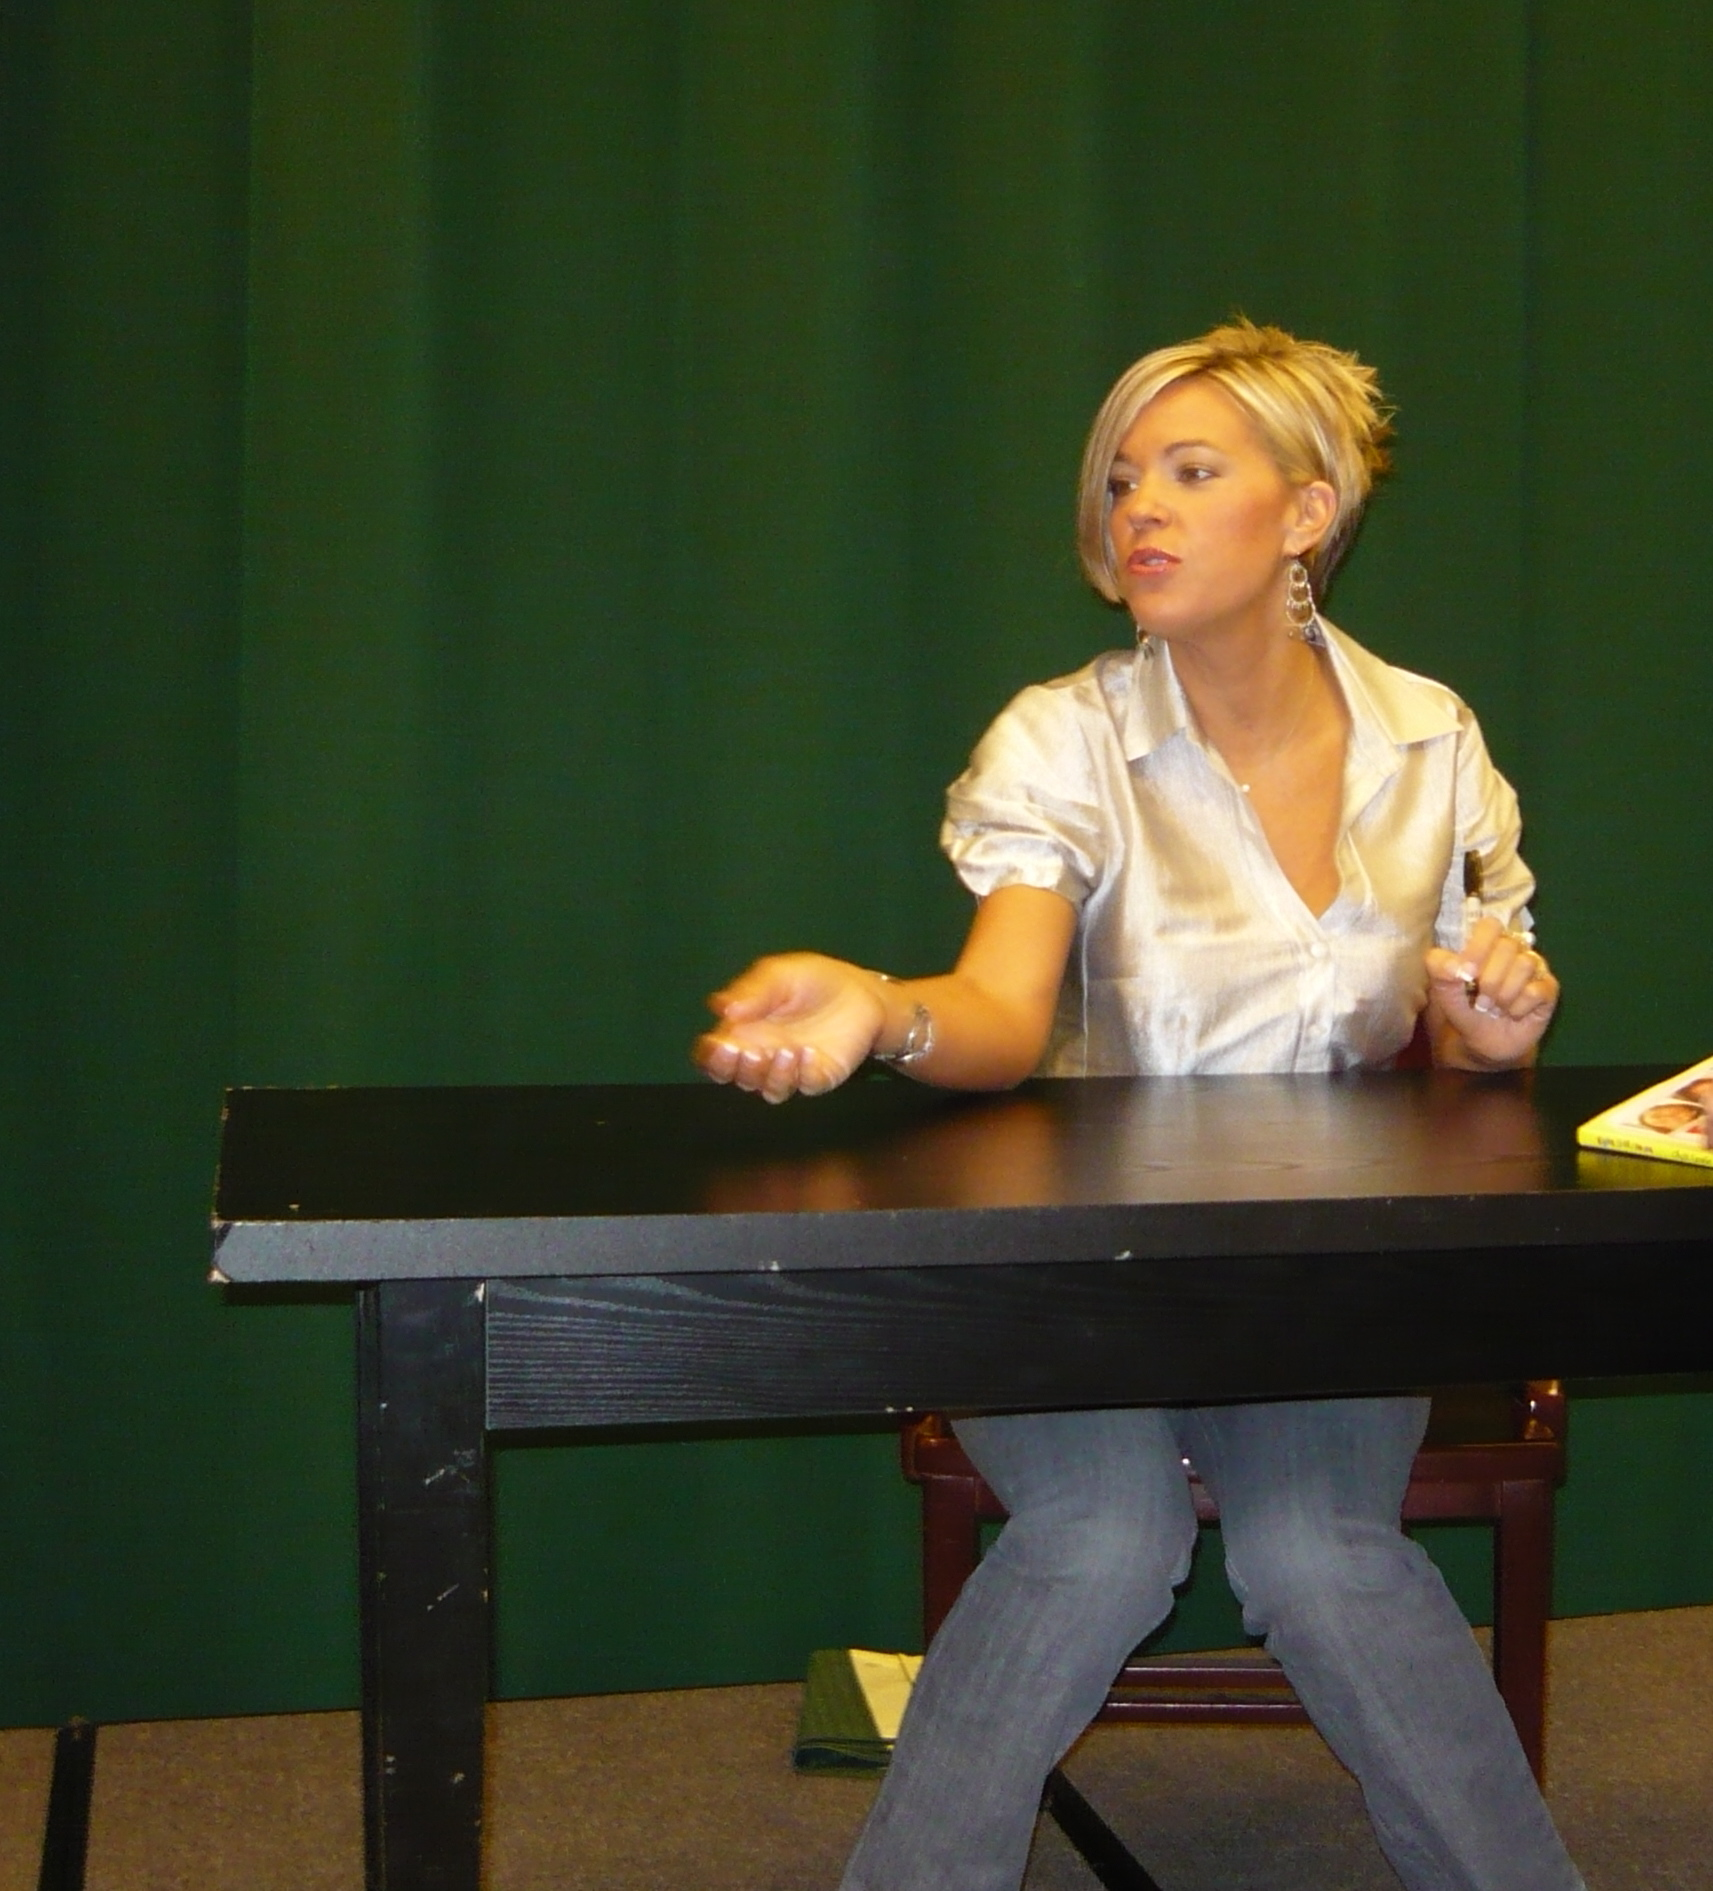 Where's My Single Mom Reality Show- Kate Gosselin Returns to TV